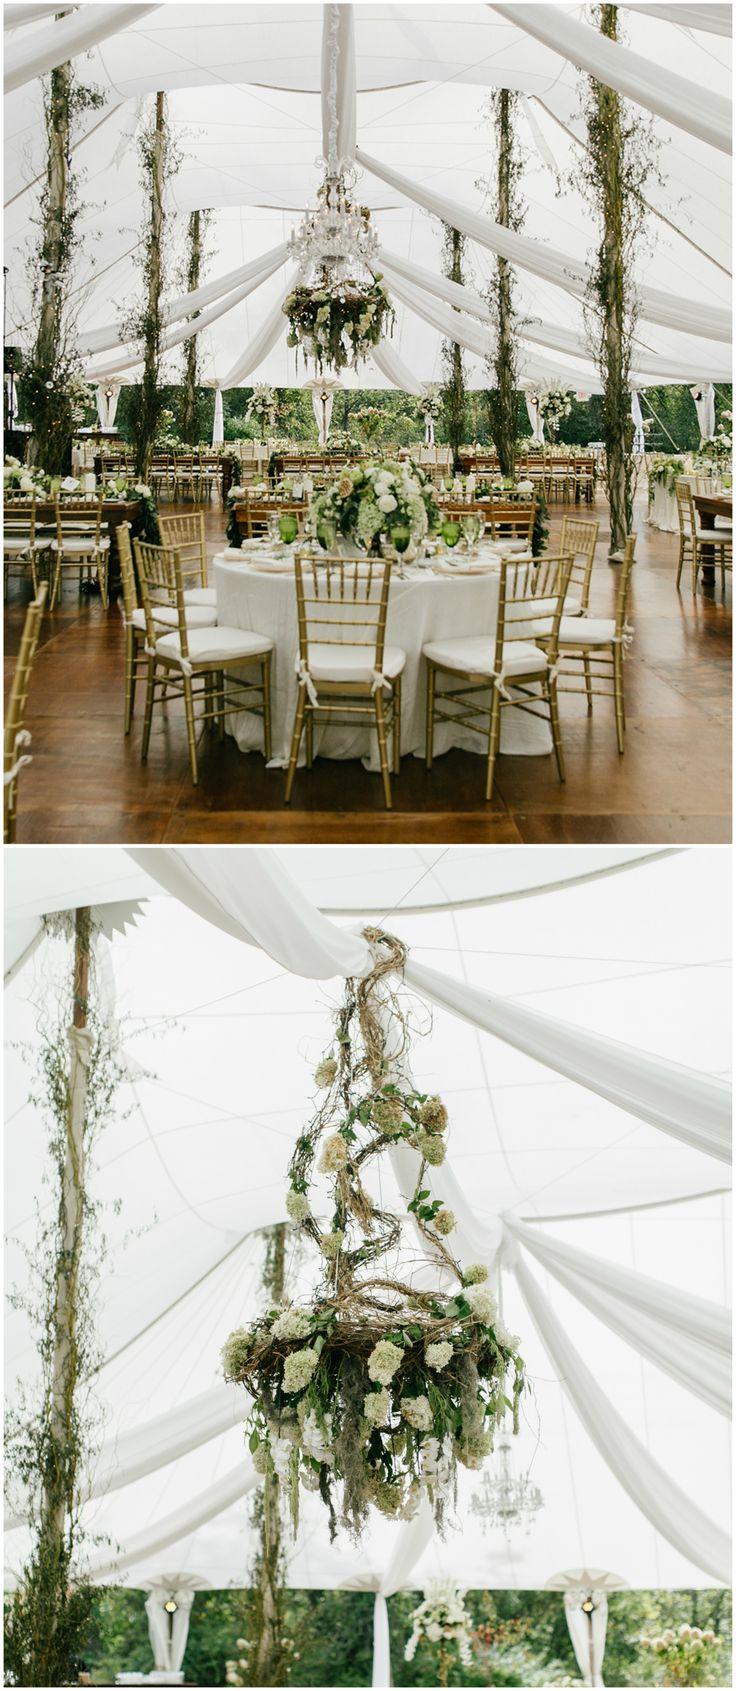 Sperry tented wedding